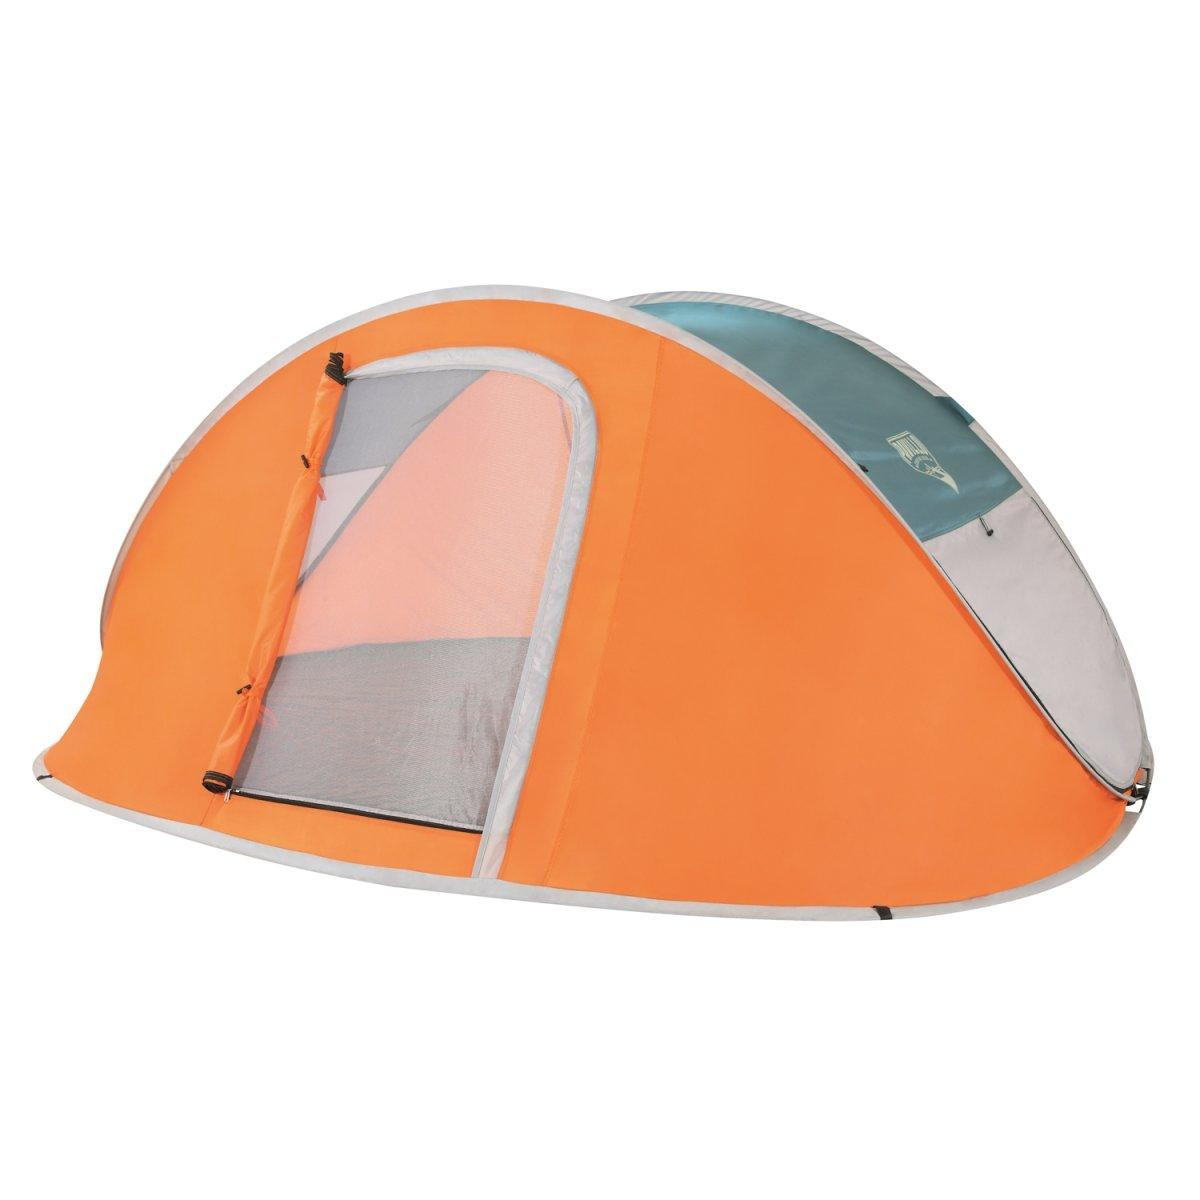 Двухместная палатка Pavillo Bestway 68004 Nucamp x2, 235 х 145 х 100 см